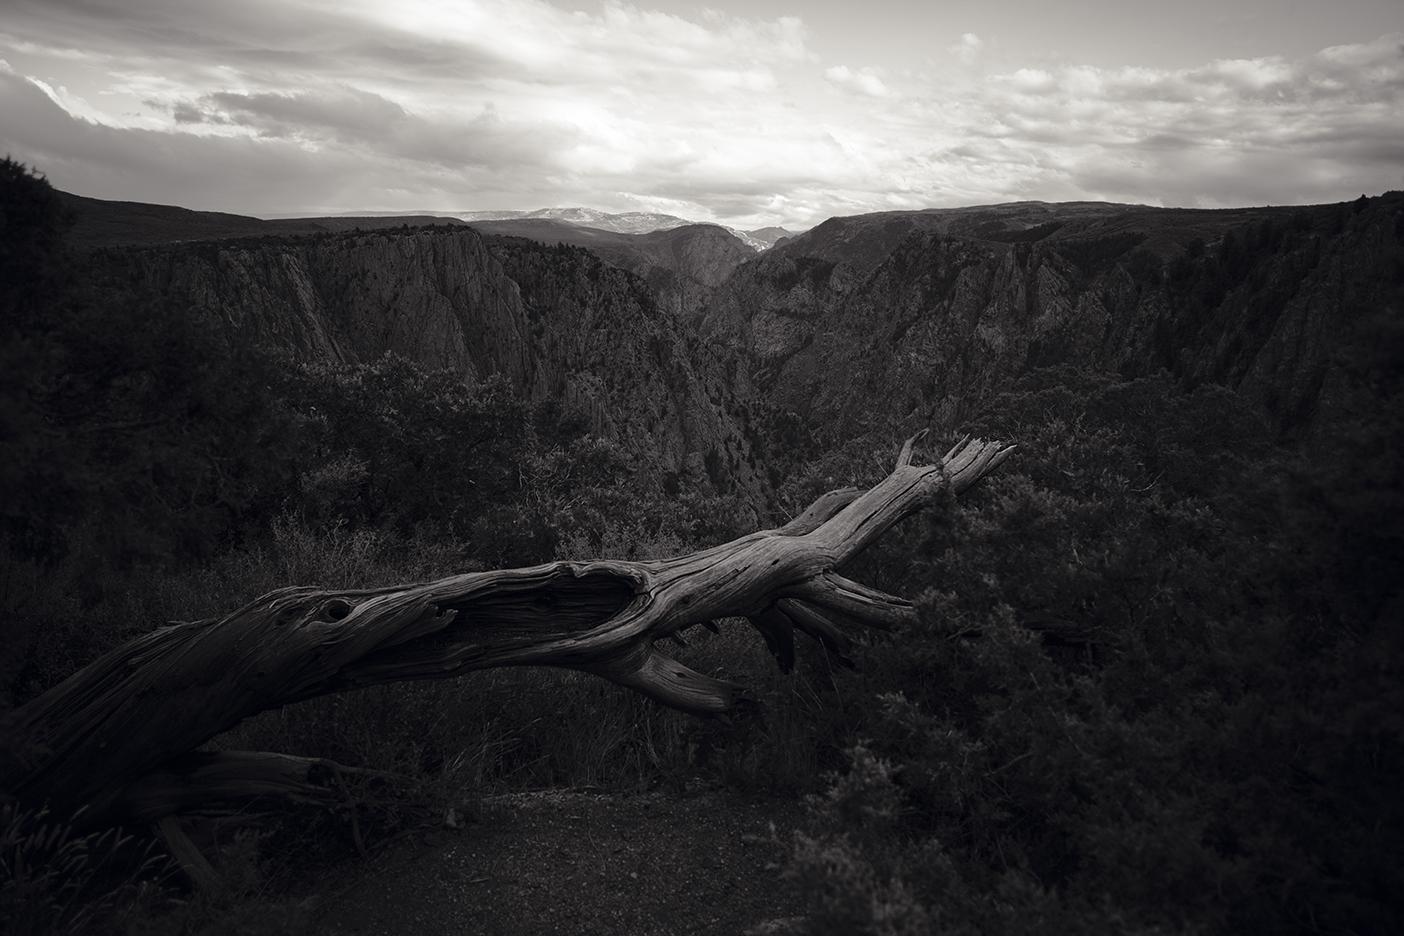 © Jonathan Urrutia